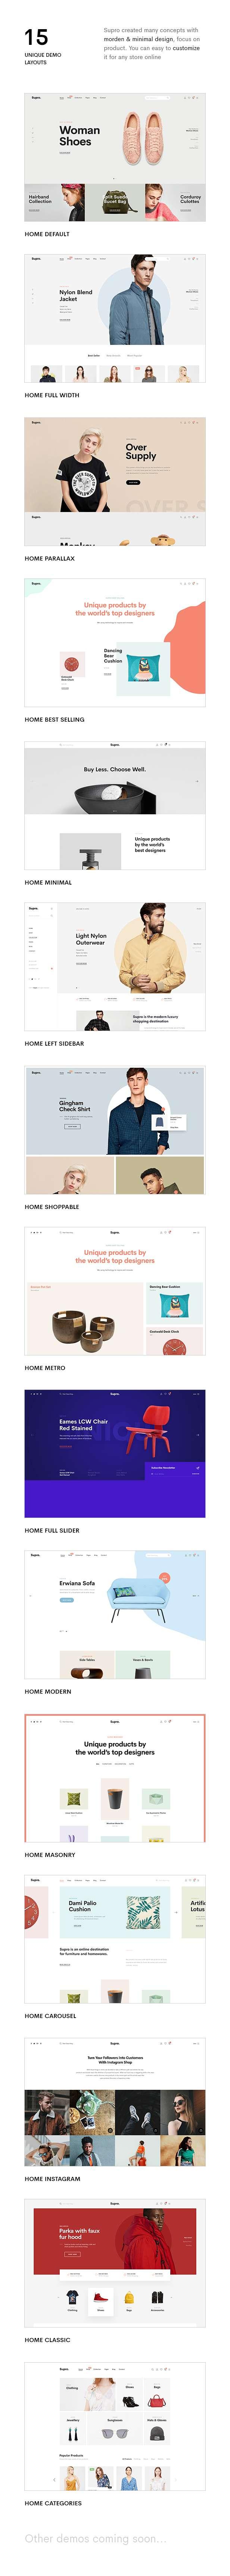 Supro | Minimalist eCommerce PSD Template - 10